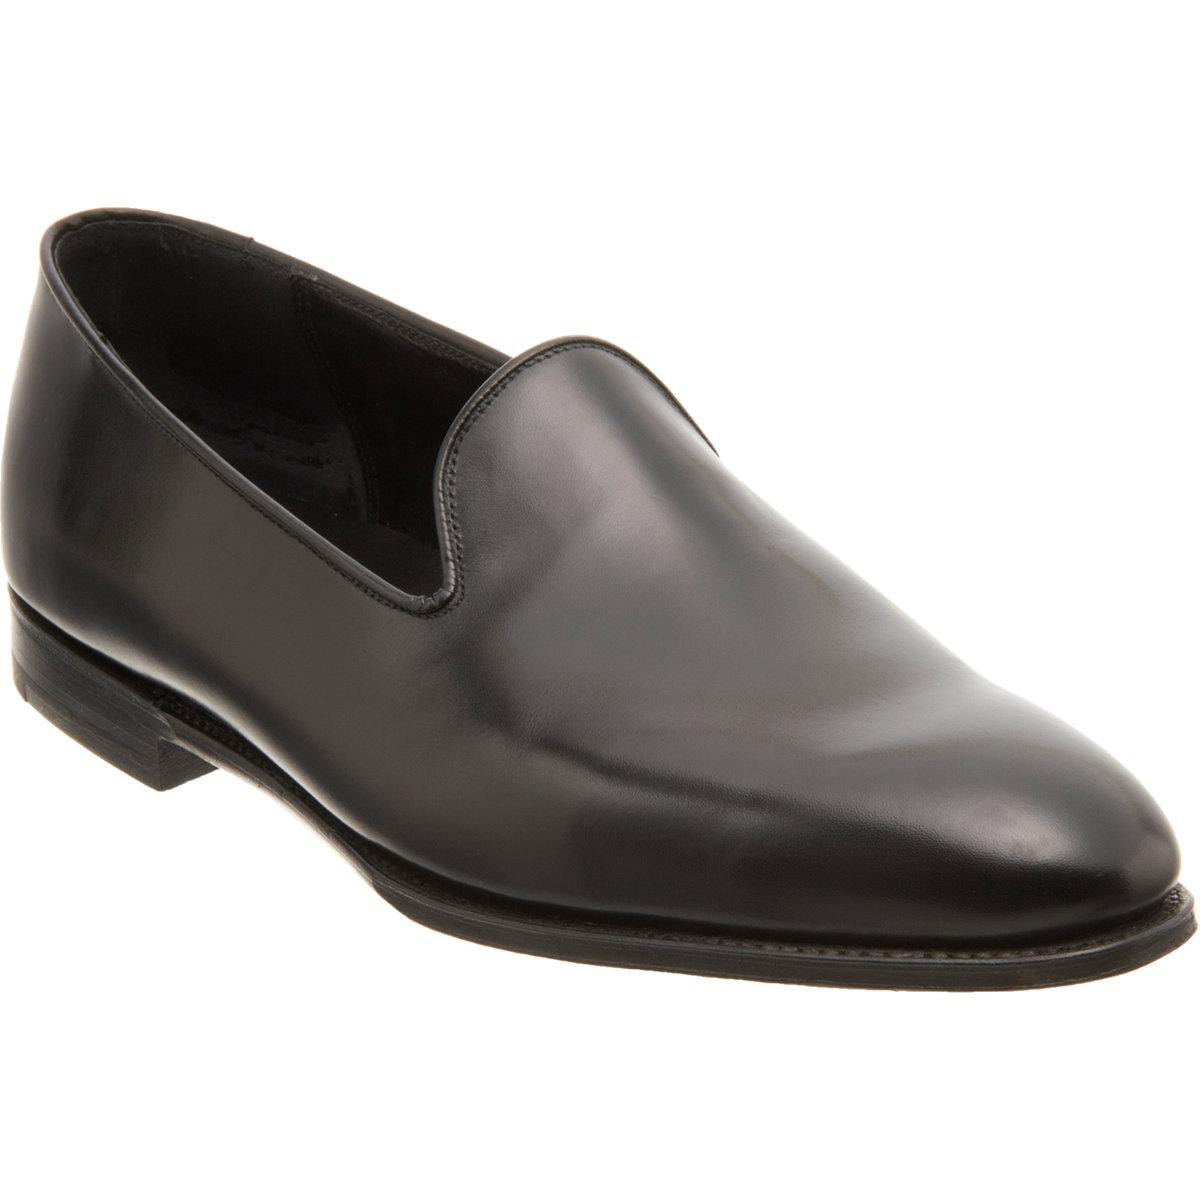 Crockett and jones Plain-toe Loafers in Black for Men